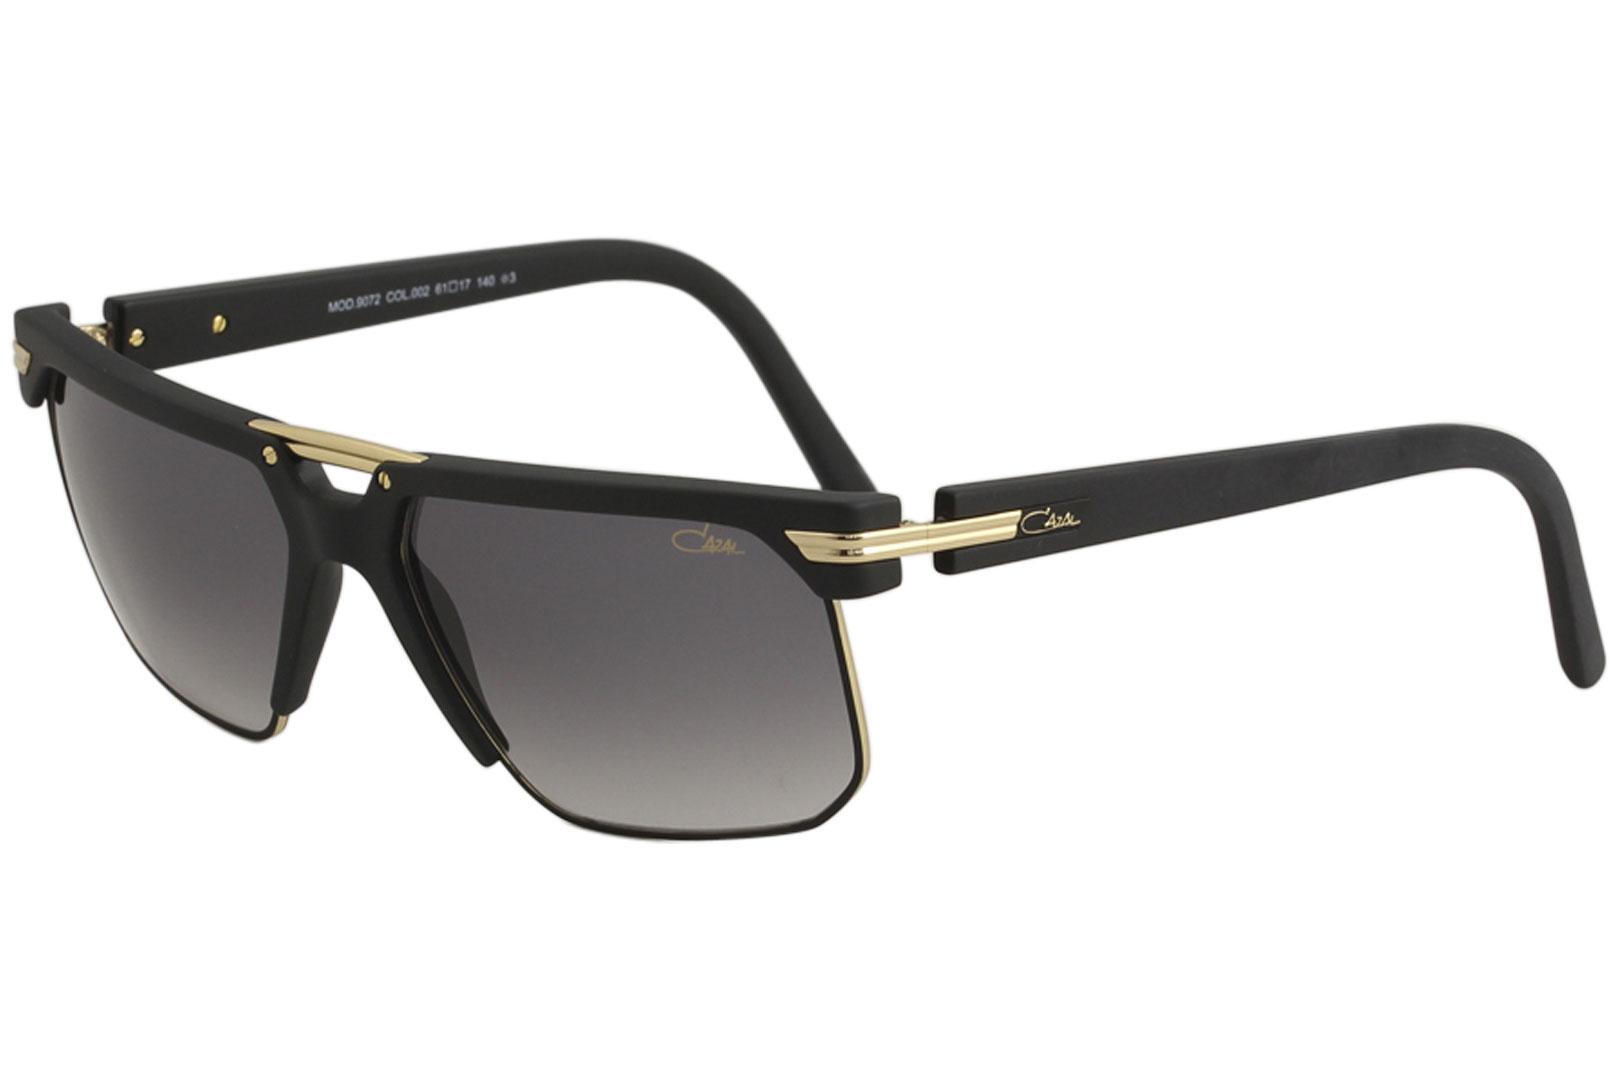 86c1333b85d Cazal Men s 9072 002 Matte Black Gold Fashion Square Sunglasses 61mm ...